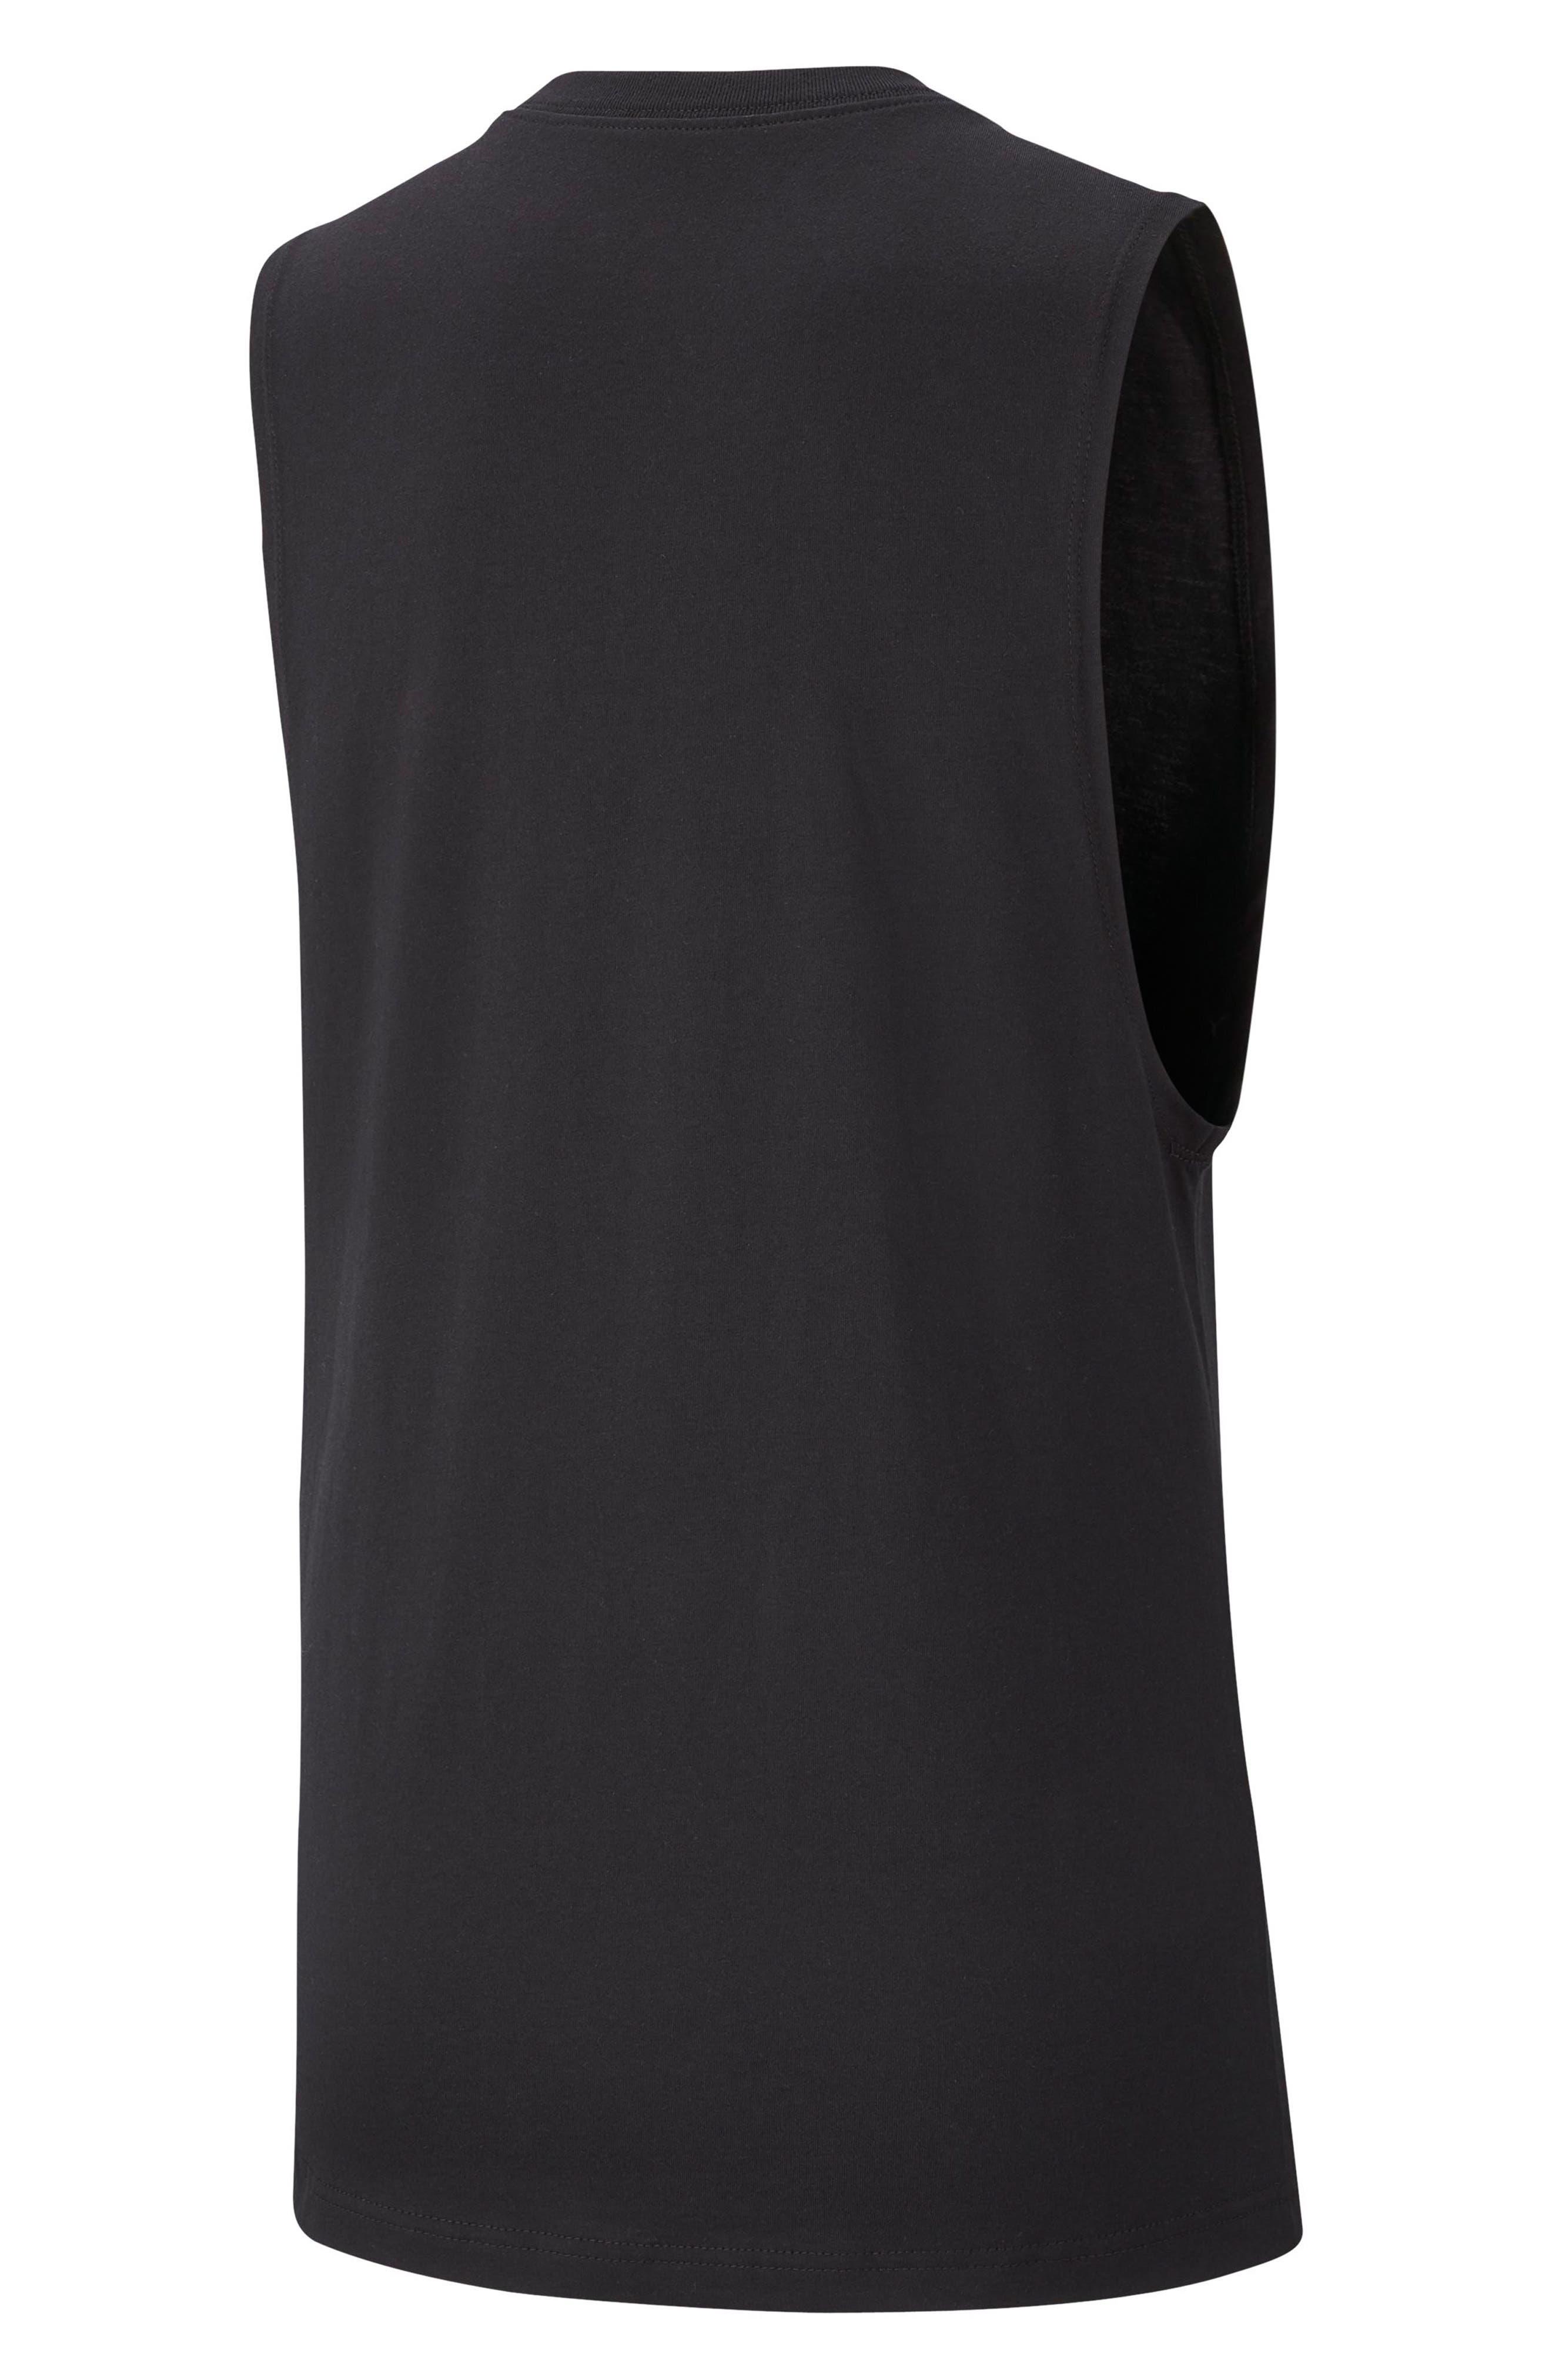 NIKE, Sportswear Essential Futura Muscle Tank, Alternate thumbnail 8, color, BLACK/ WHITE